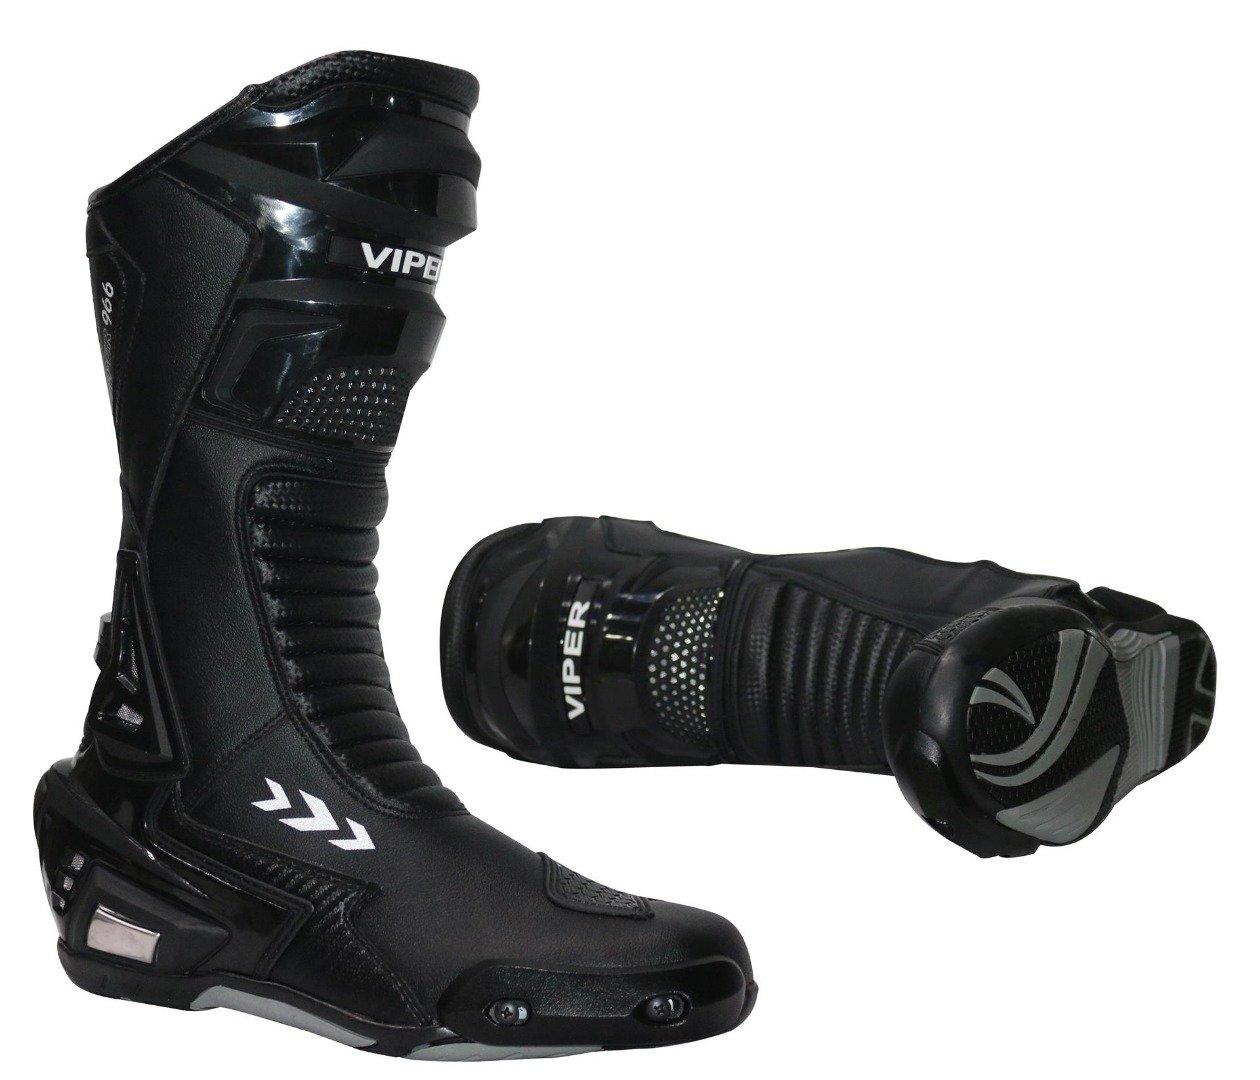 39//5 /– 47//13, Schwarz - Schwarz Viper 966S CE Sports Racing Boots Motocross Enduro MX Off Road Abenteuer Dreckige Fahrrad Quad BMX ATV Motorrad Mountainbike Stiefel 42//8